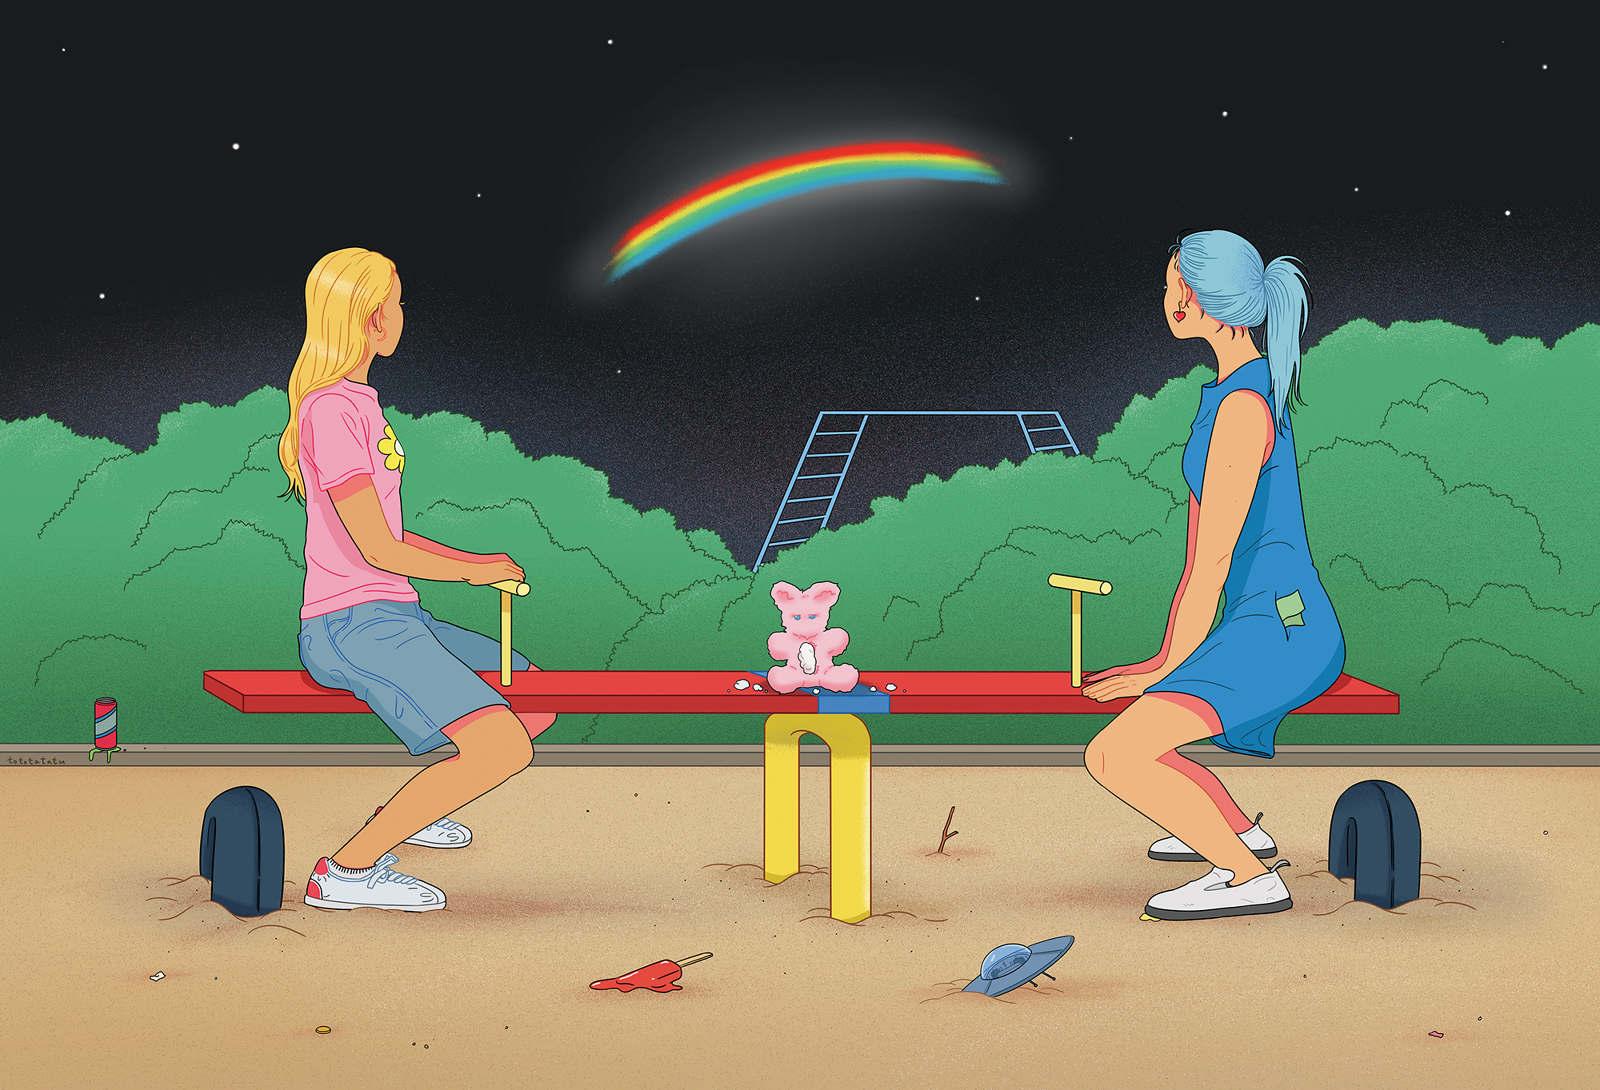 GirlsclubAsia-Illustrator-Seoyoung-tototatatu-8